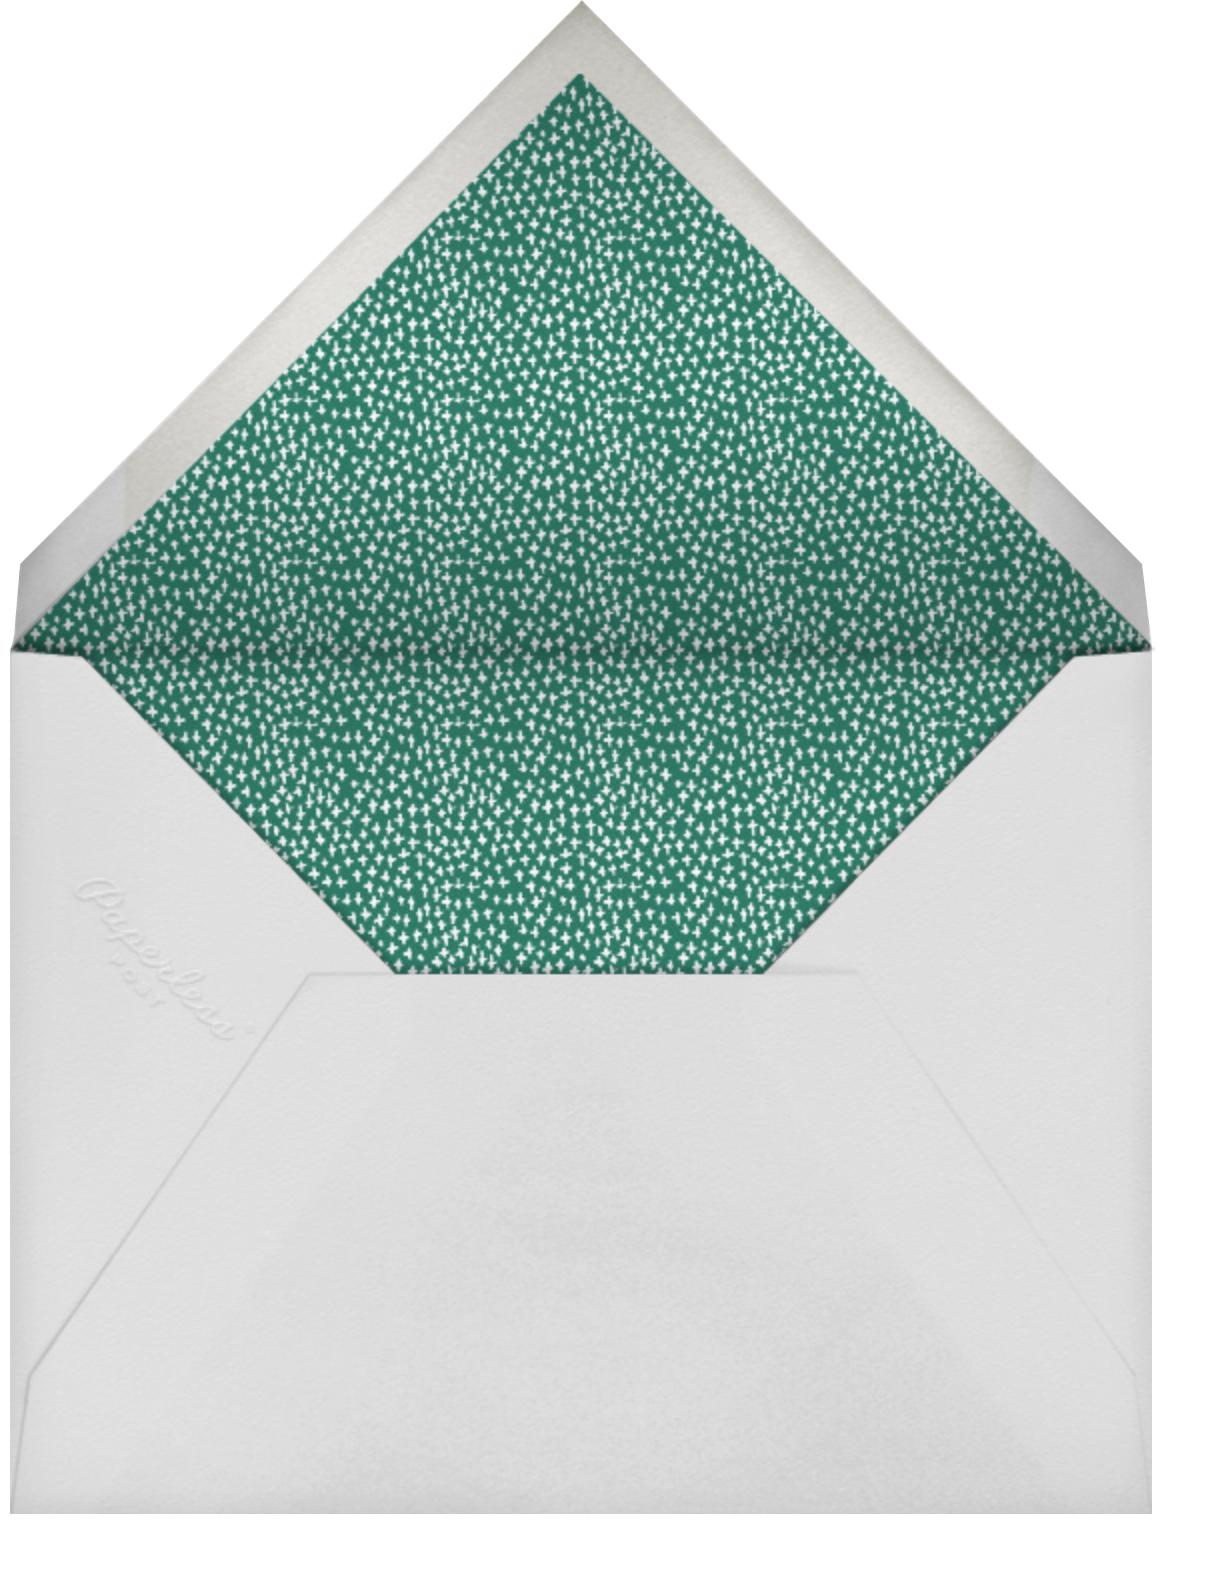 Quilted Wreath Frame - Mr. Boddington's Studio - Envelope